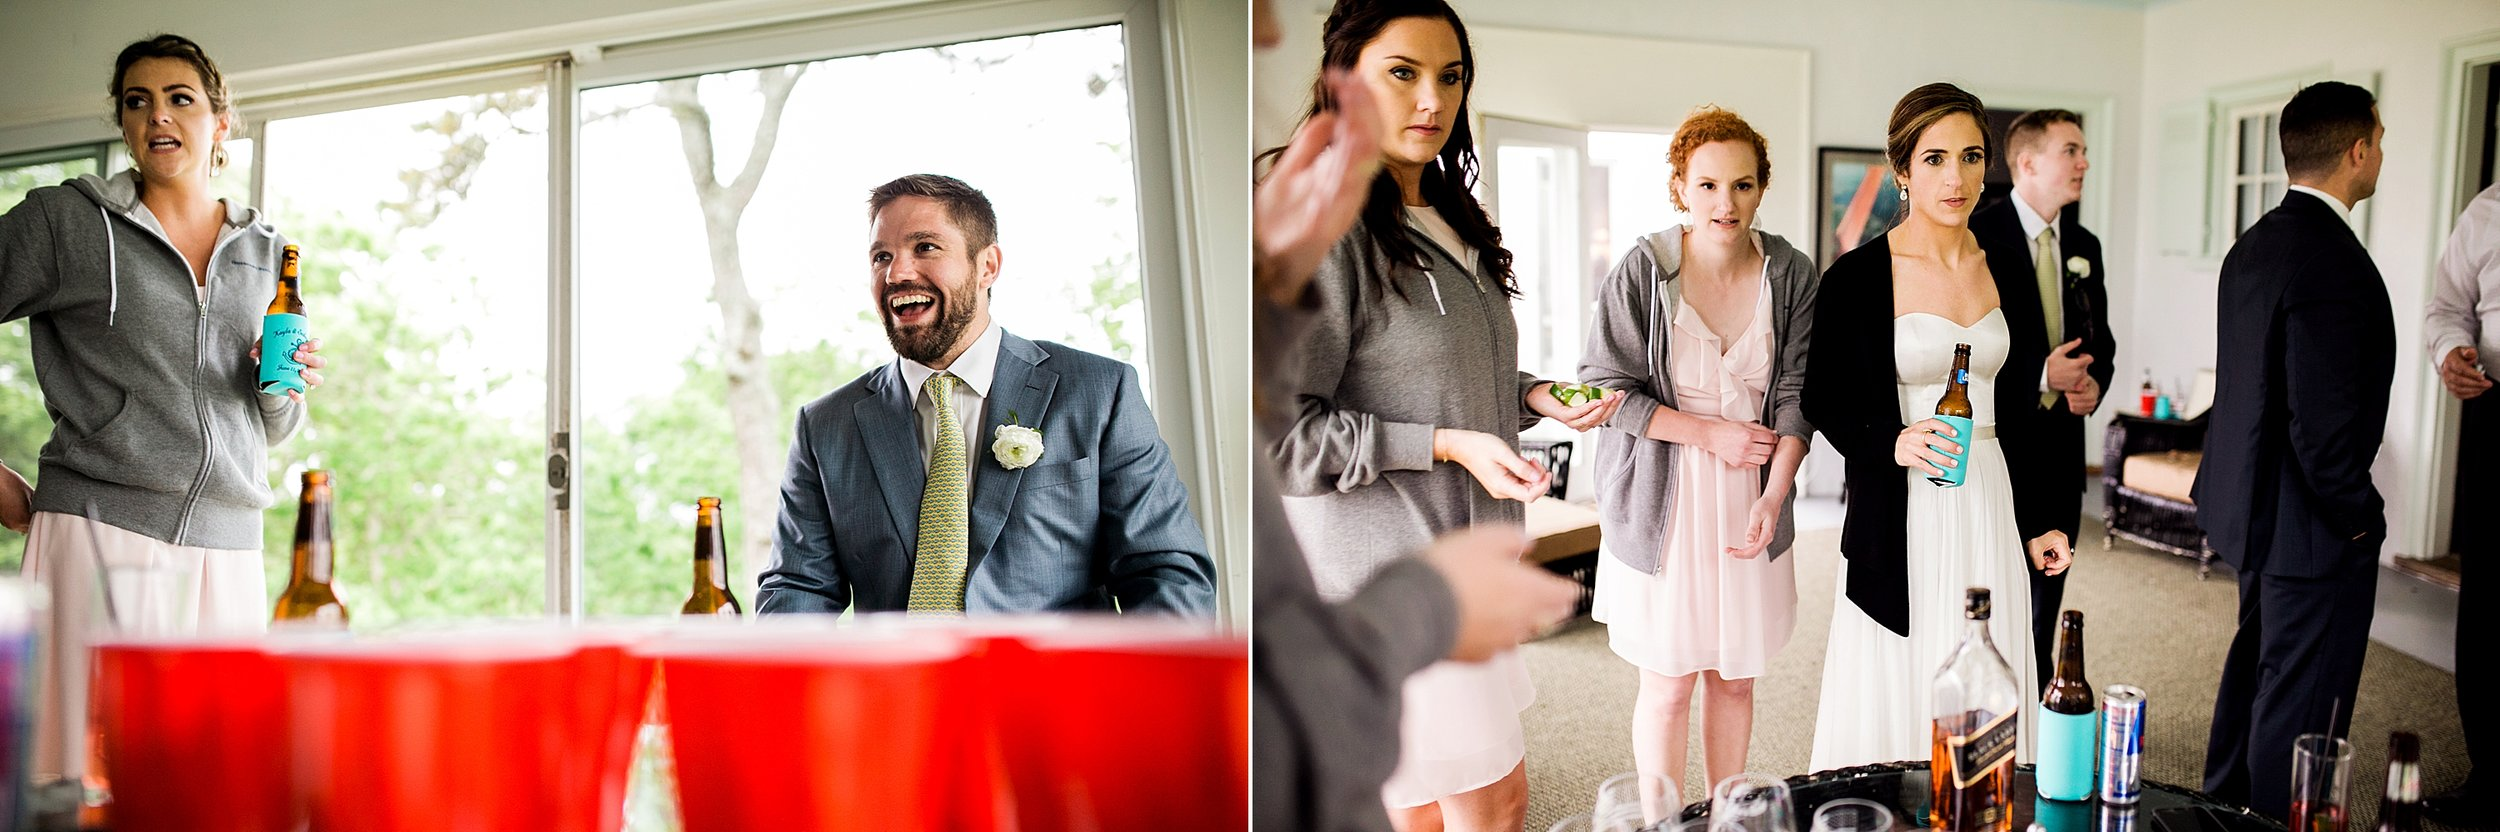 065 los angeles wedding photographer todd danforth photography cape cod.jpg